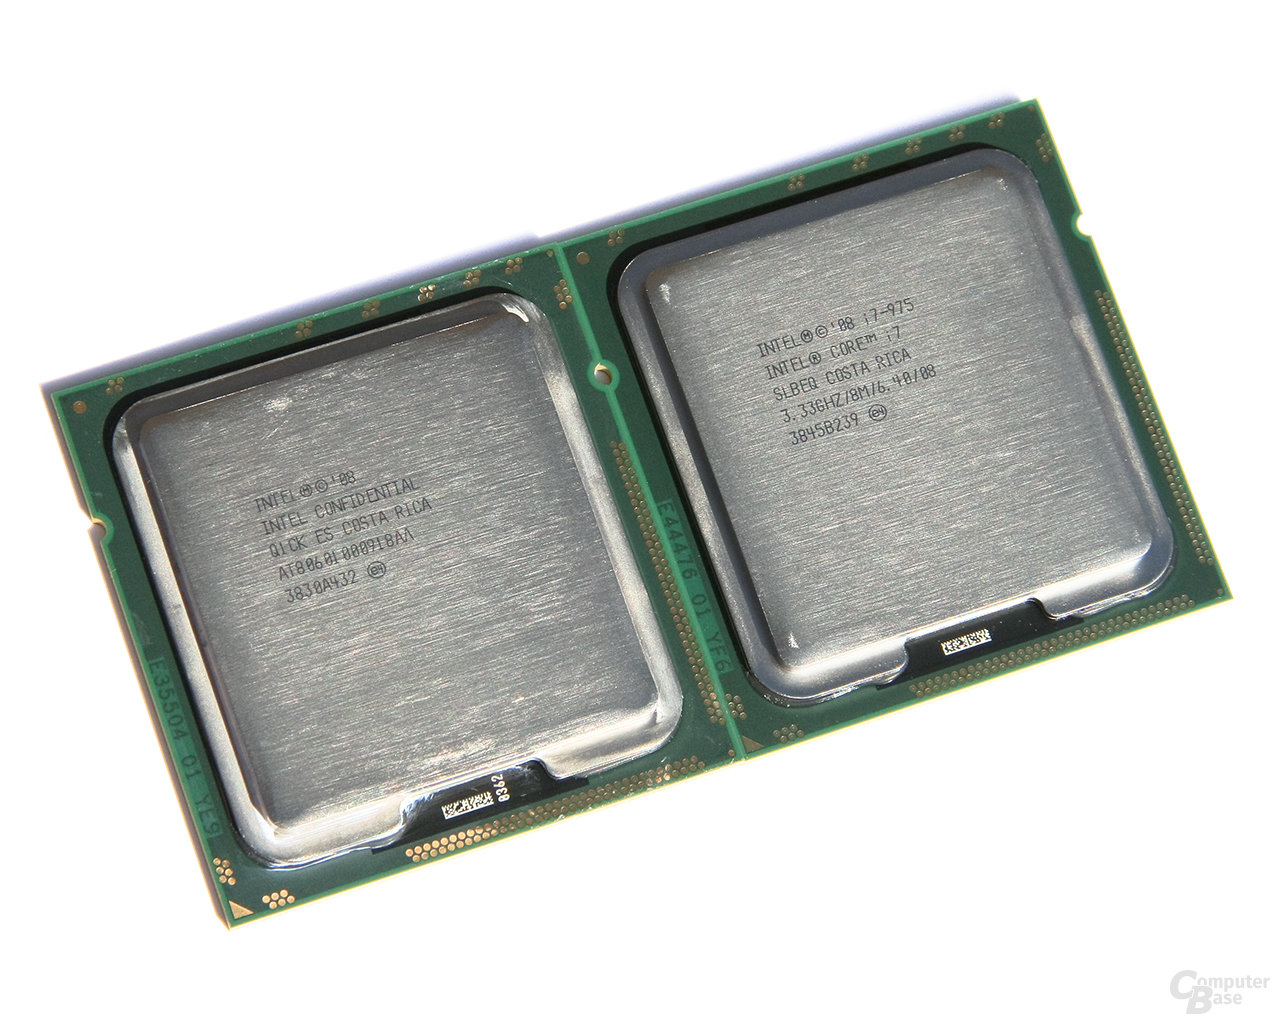 Intel Core i7 965 und 975 Extreme Edition